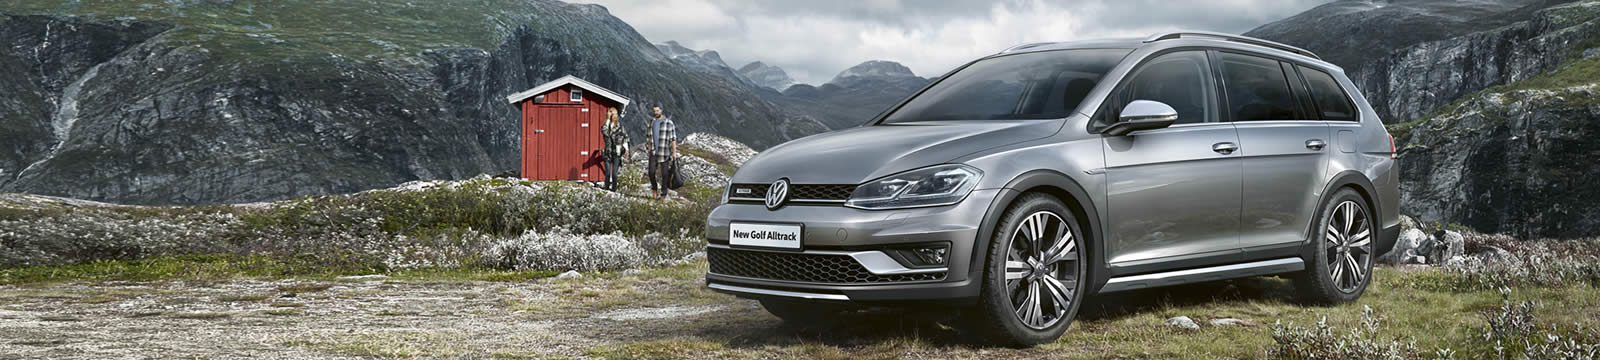 Book a Volkswagen Service or MOT Online | Inchcape